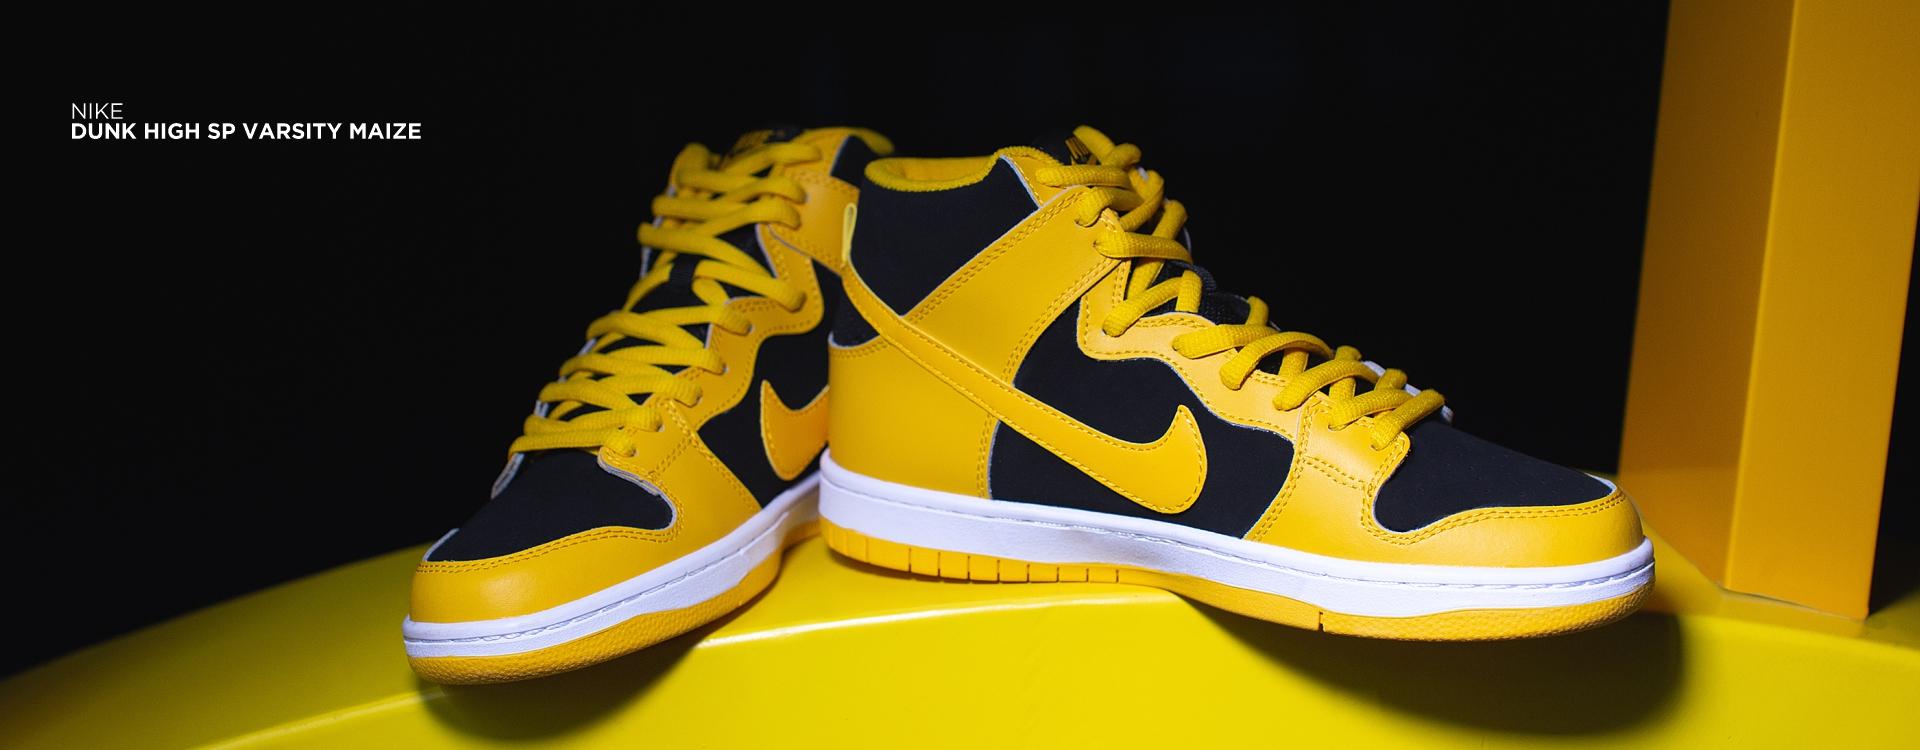 Кроссовки Nike Dunk High «Varsity Maize»